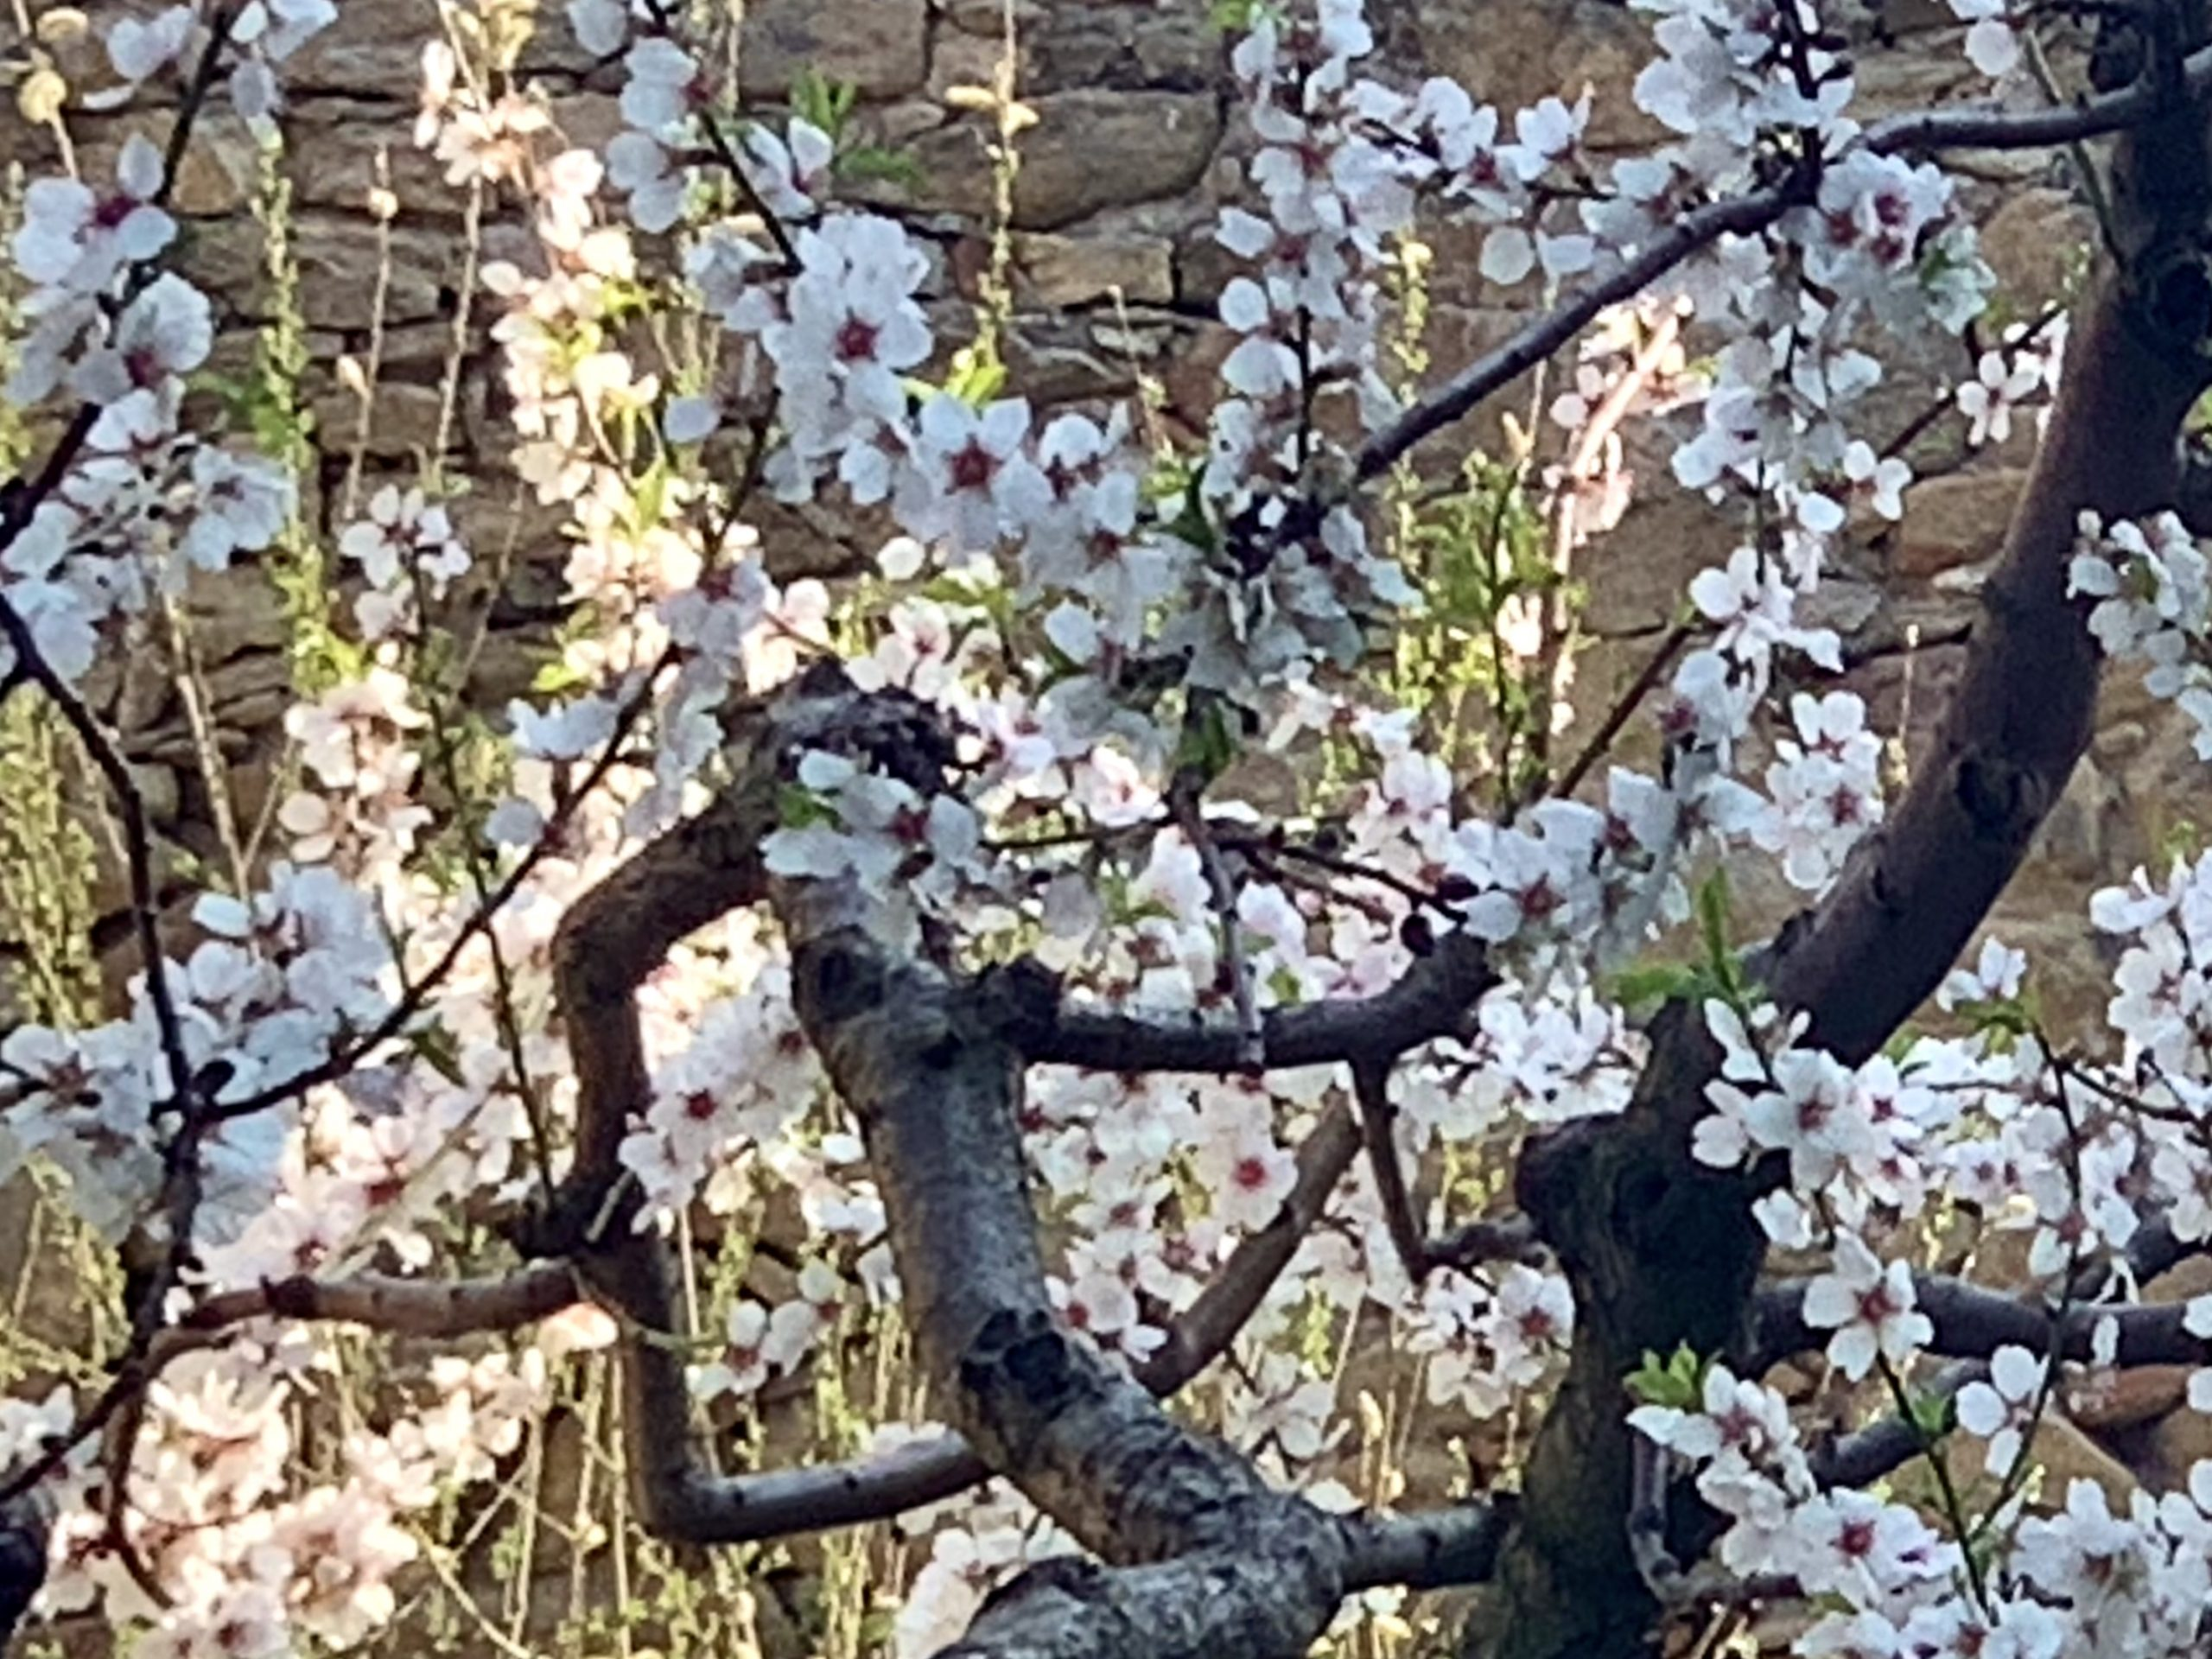 Blomstrende aprikostrær i Weißenkirchen i Wachau